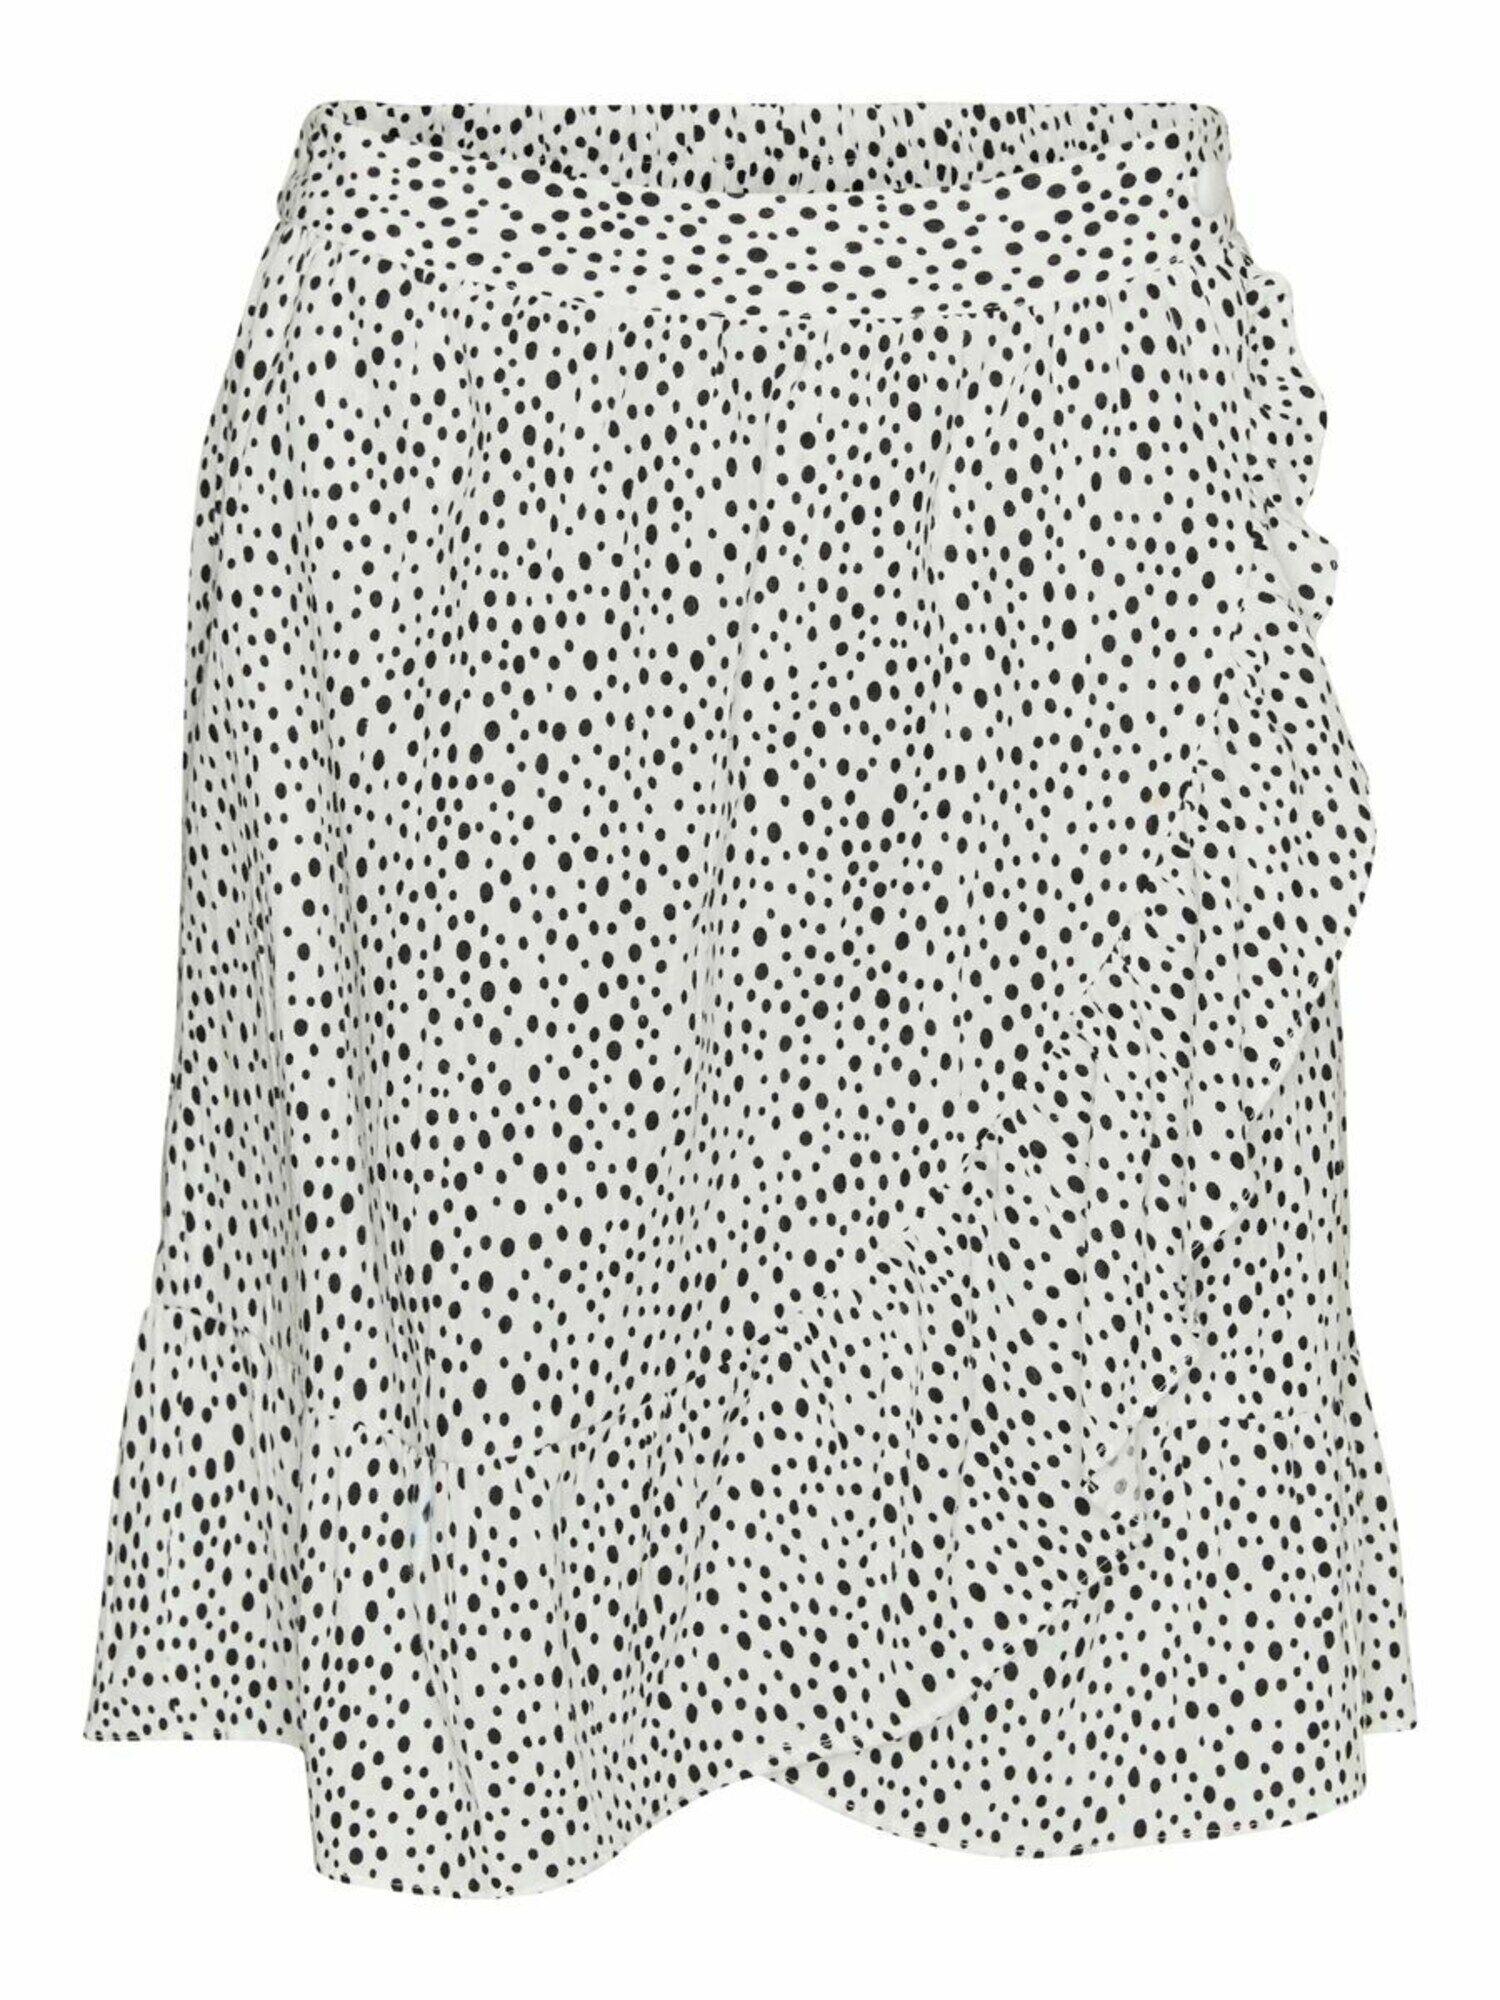 VERO MODA Jupe  - Blanc - Taille: XS - female